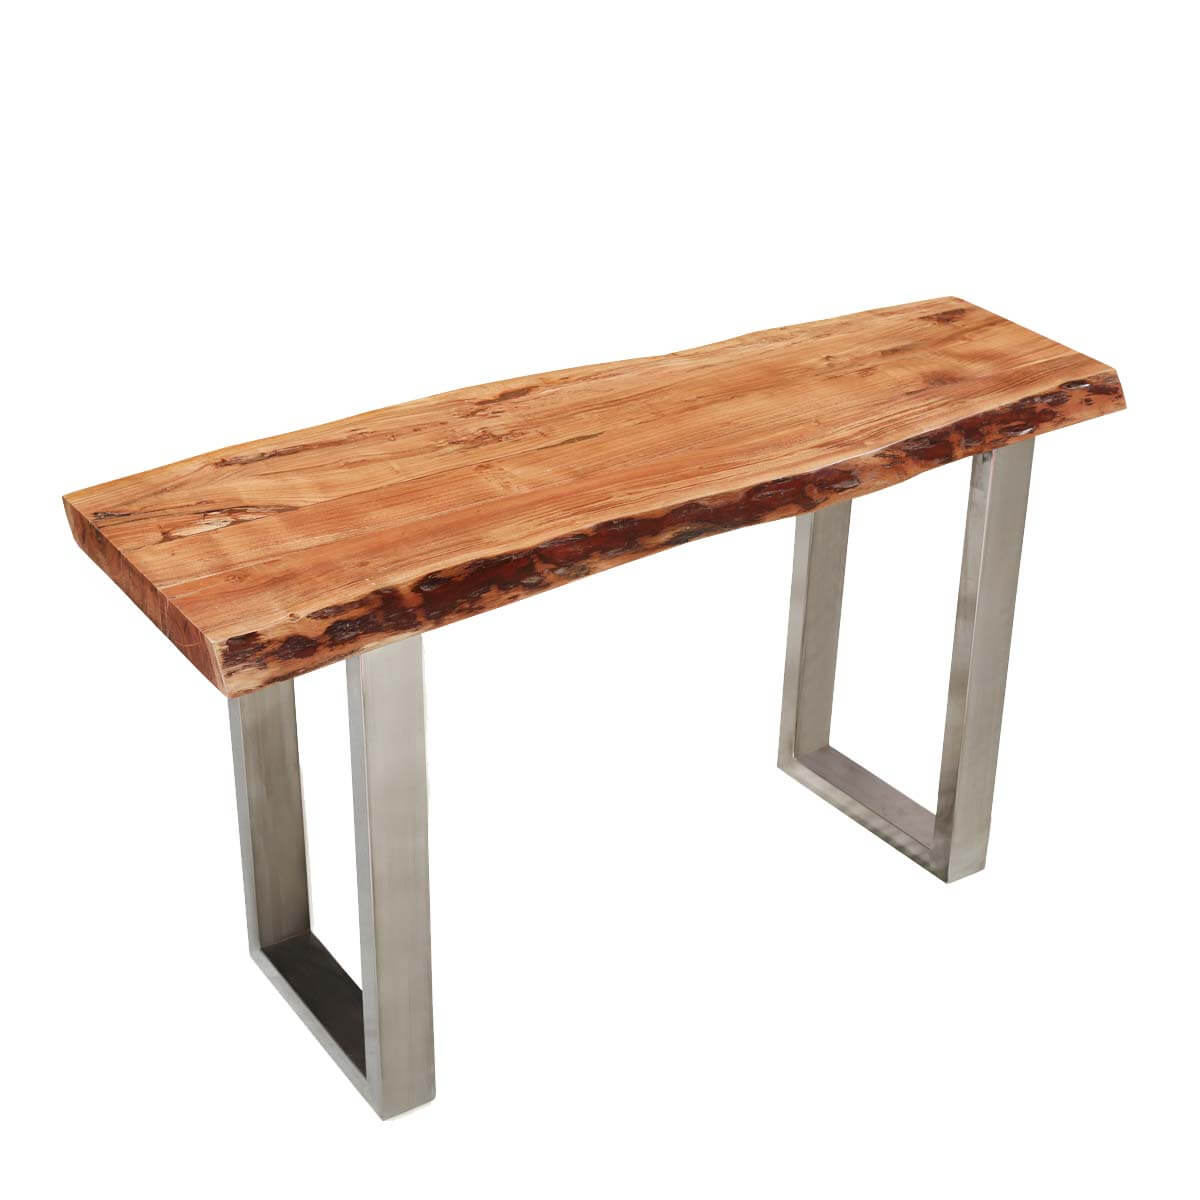 Natural Edge Acacia Wood & Steel Hall Console Table. Glass Drawer Pulls. Quietest Desk Fan. Lap Desk With Cooling Fan. Diy Pipe Desk Plans. Kitchen Table Sets Under 200. Toddler Table Chair Set. Loft Bunk Bed Desk. Desk Paper Holder